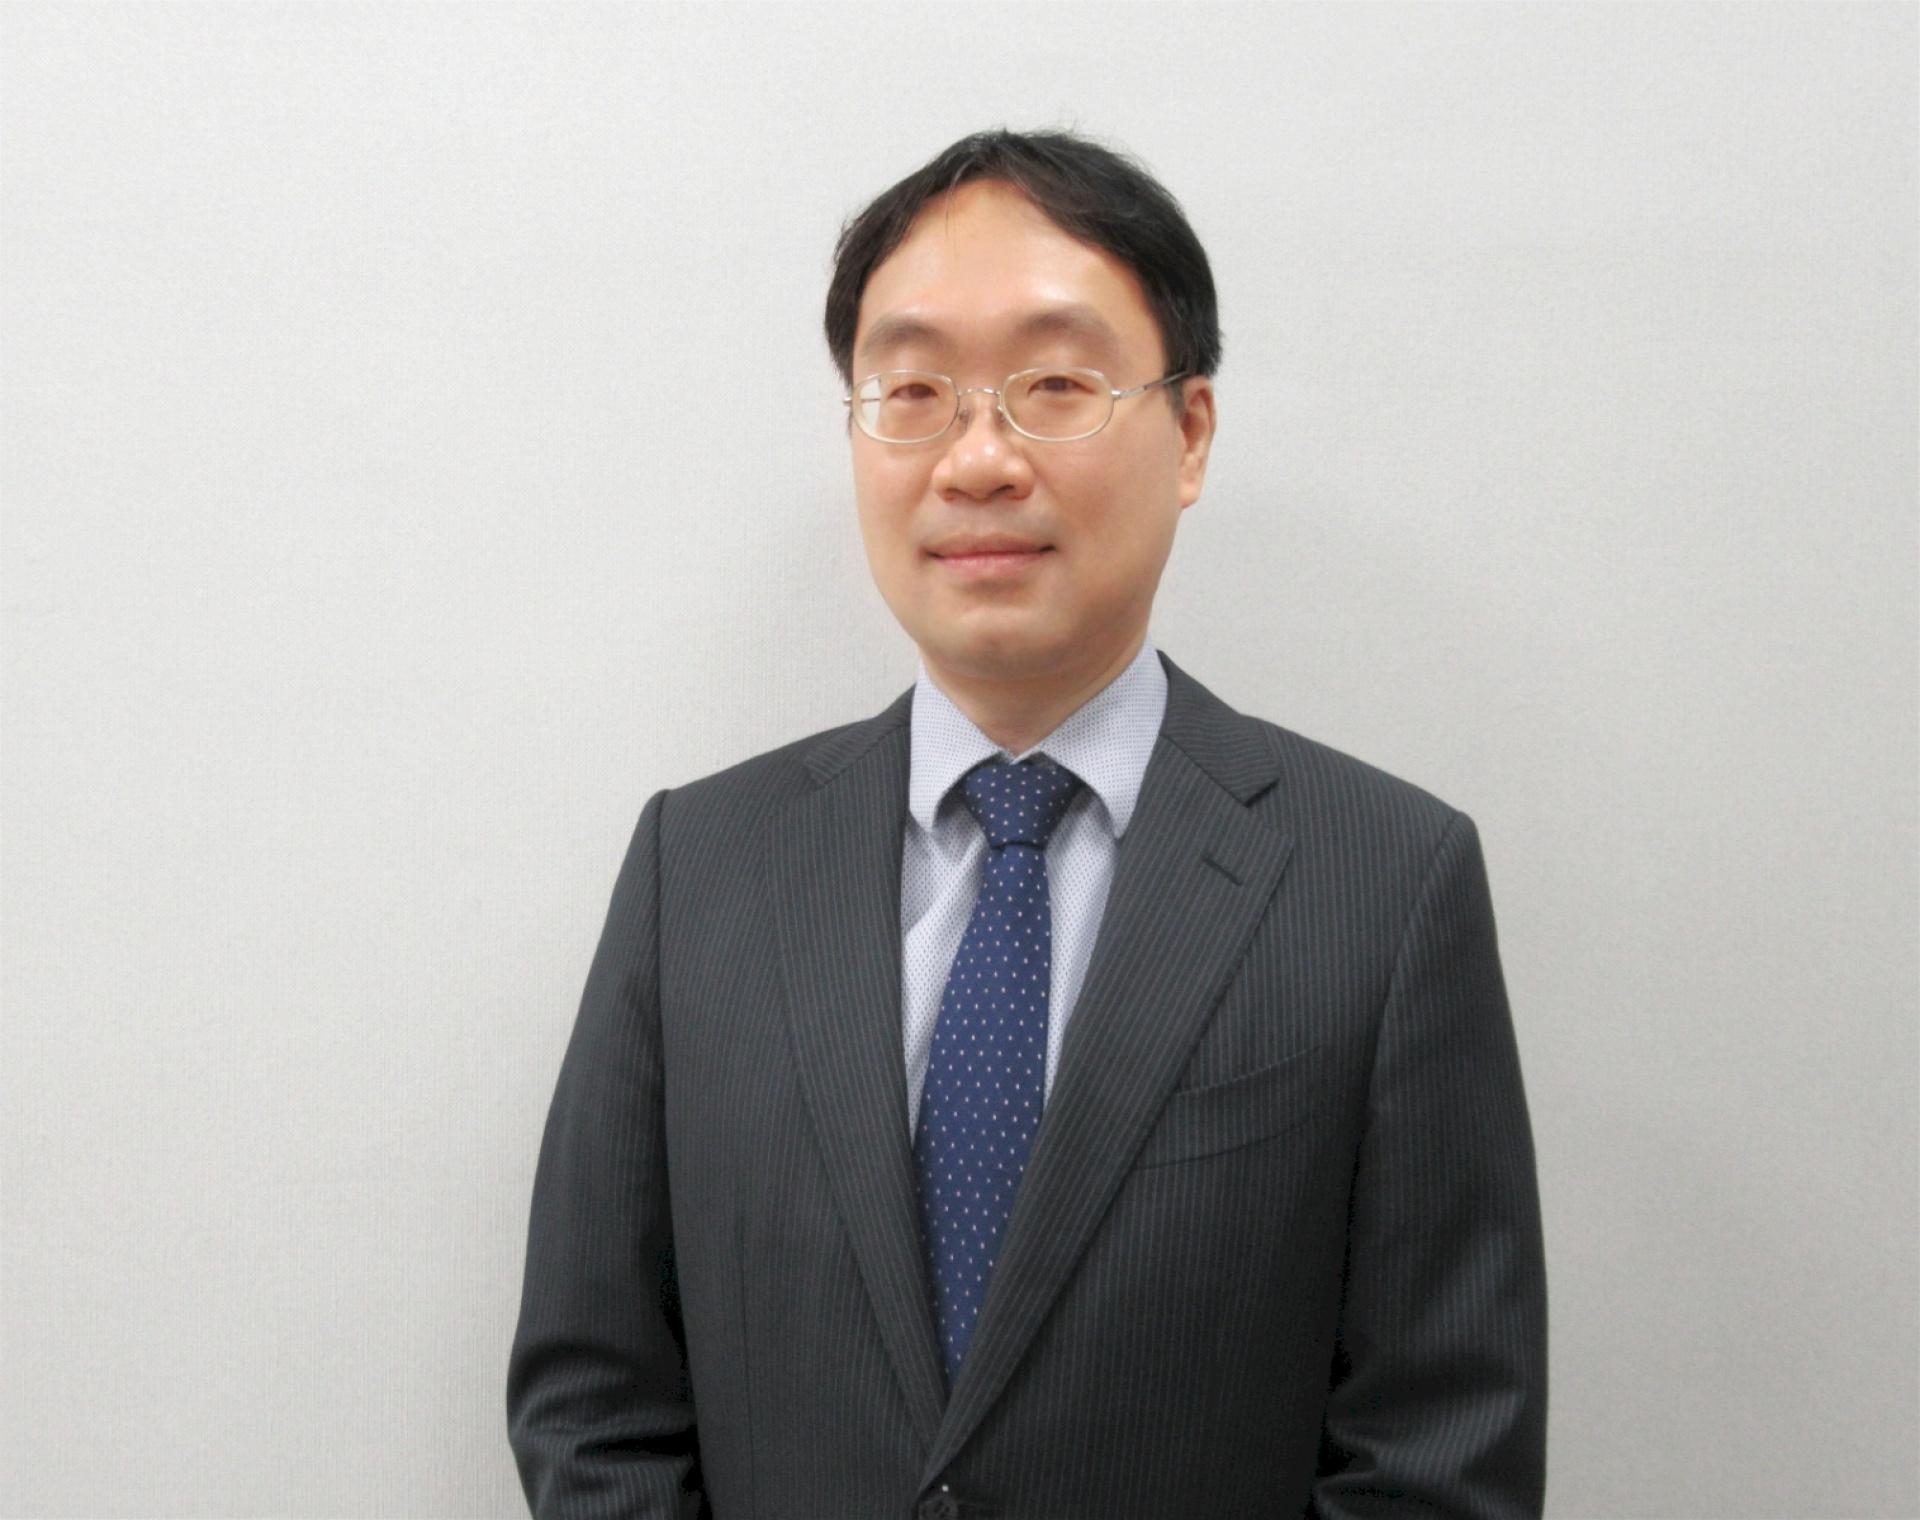 Jyun-yi Lee